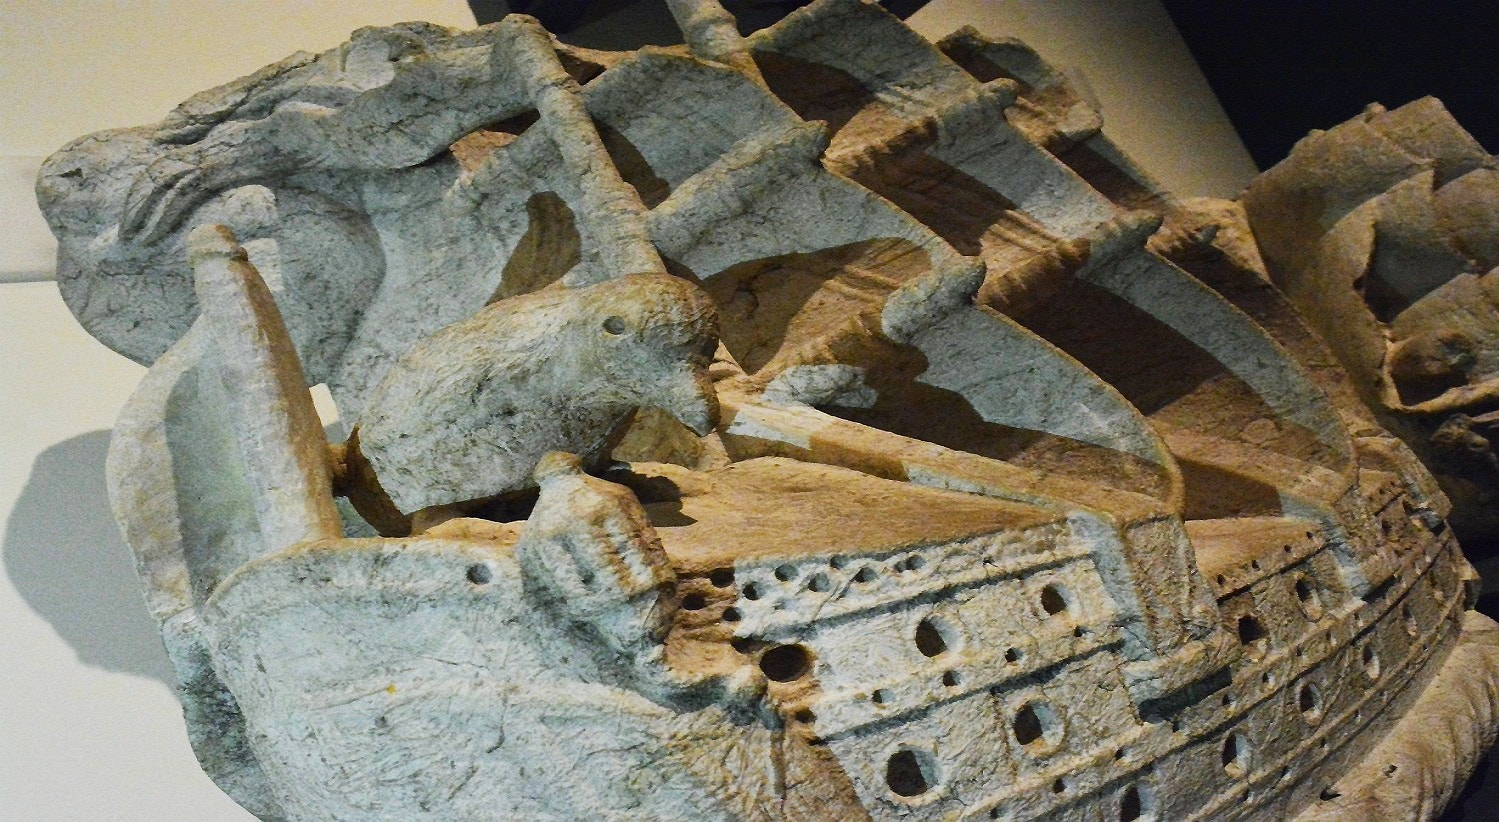 Pedra de Armas da cidade de Lisboa. Séc. XVI. Destaca-se o corvo pousado na nau, símbolo de Lisboa